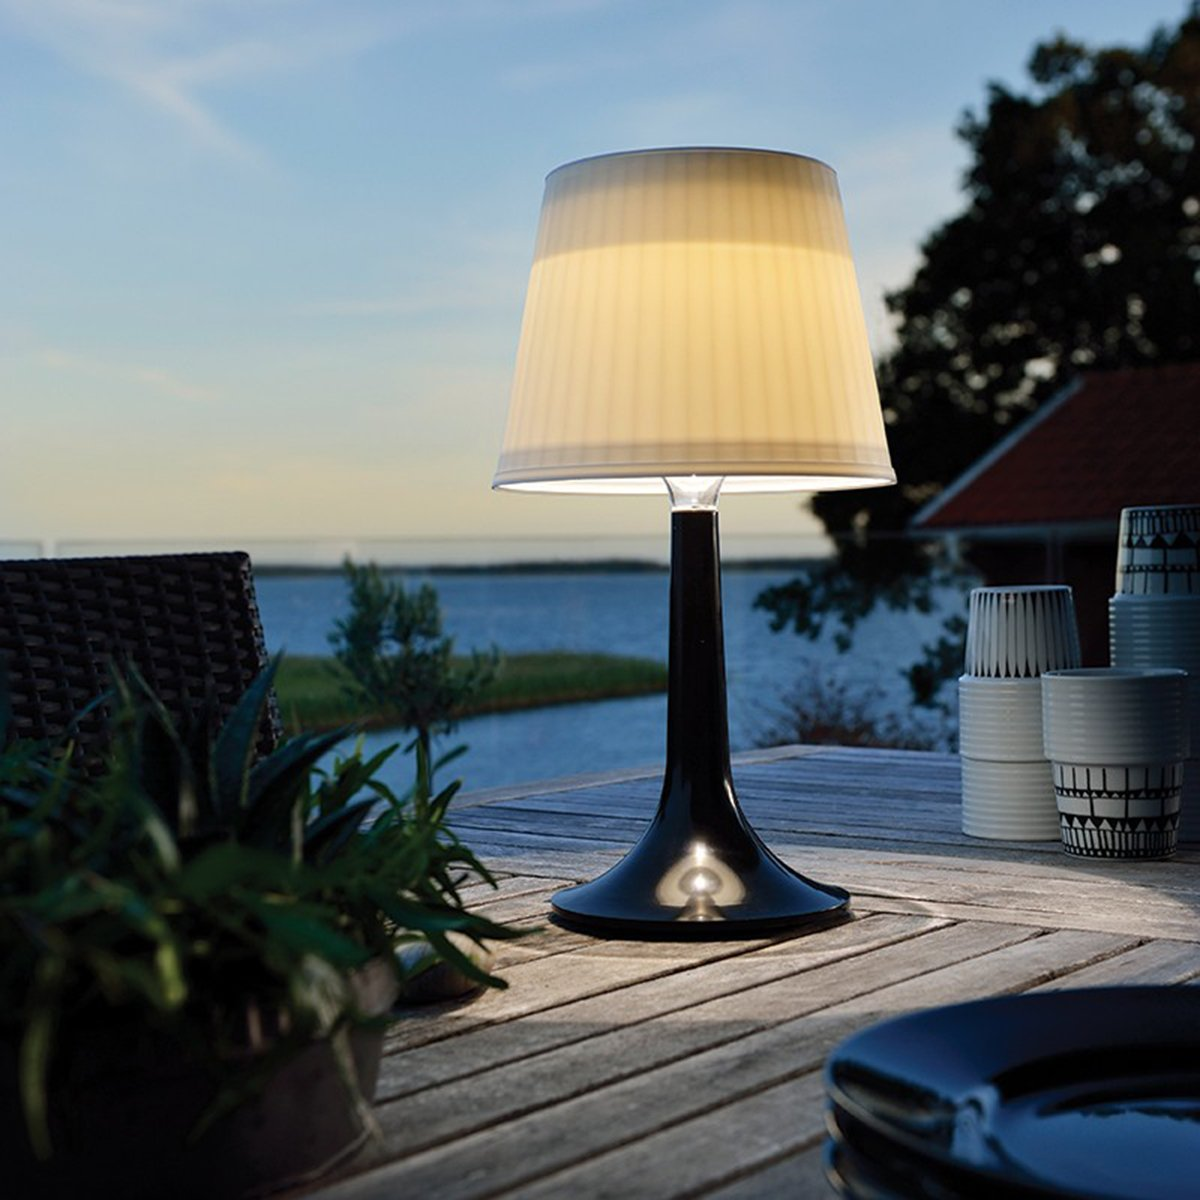 LED Solar Table Lamp Desk Lamp White Night Lights Indoor Outdoor Table Lights (Black)